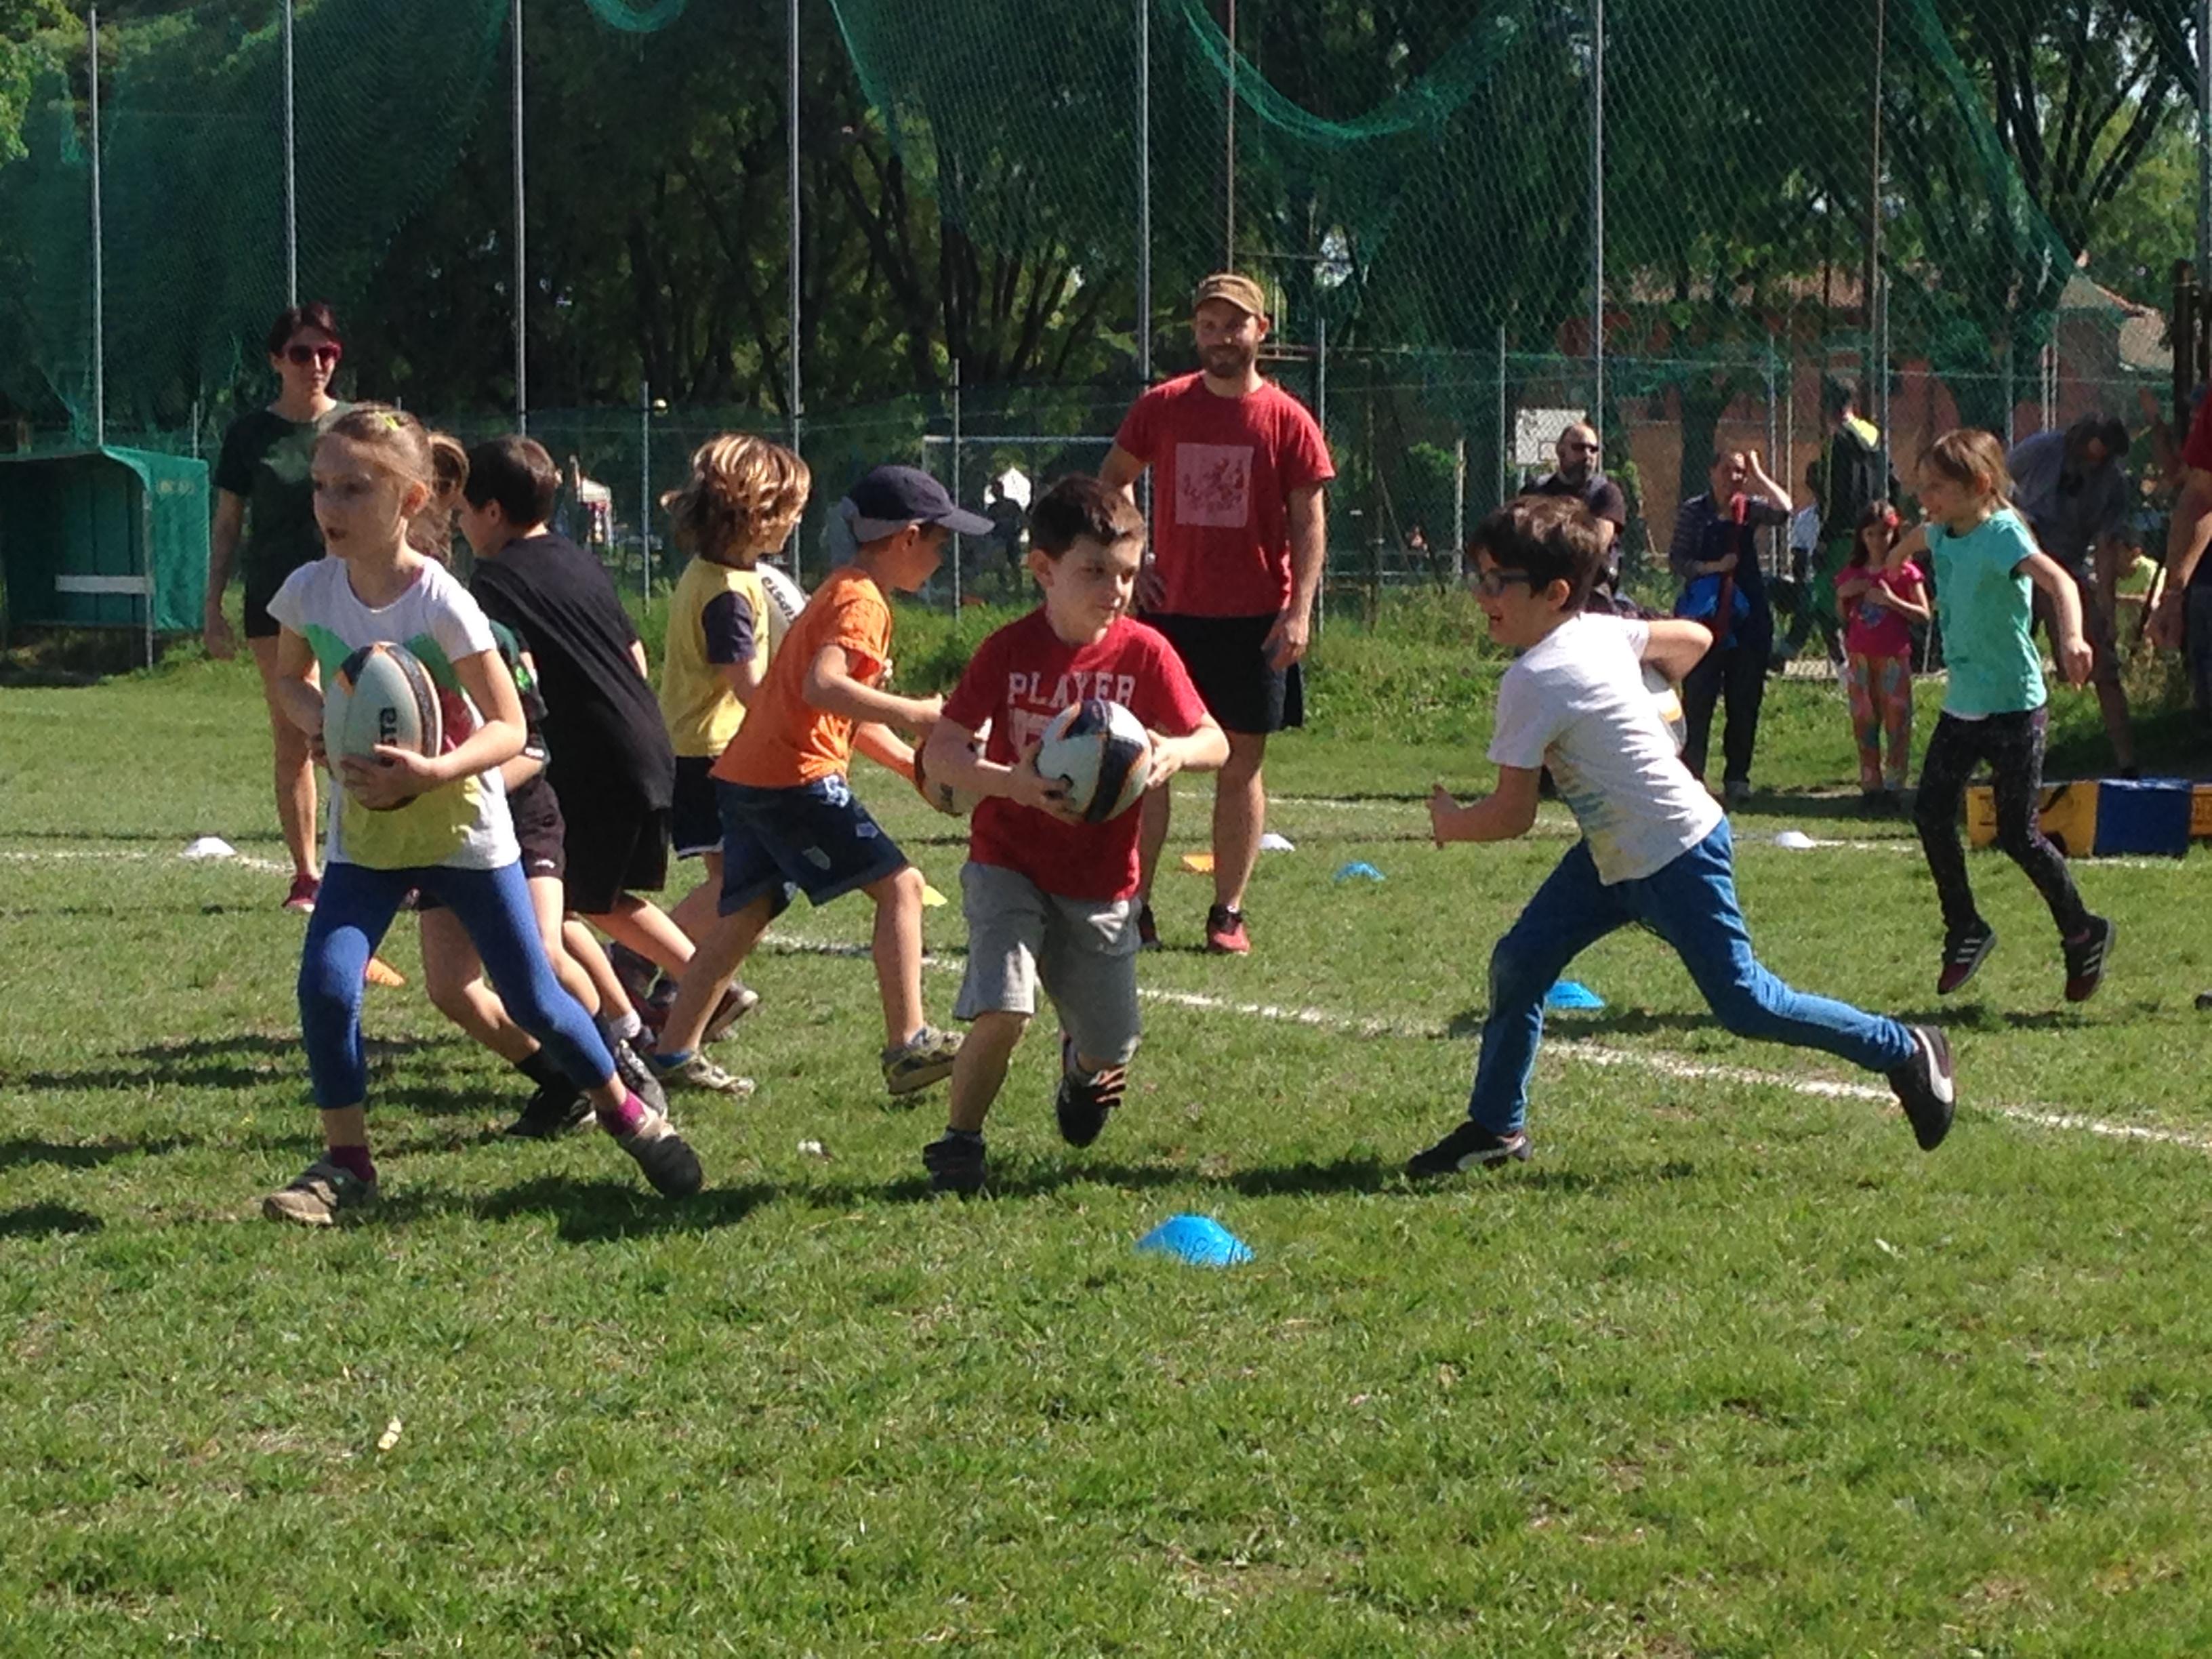 scuola-ovale-bologna-rugby-bambini